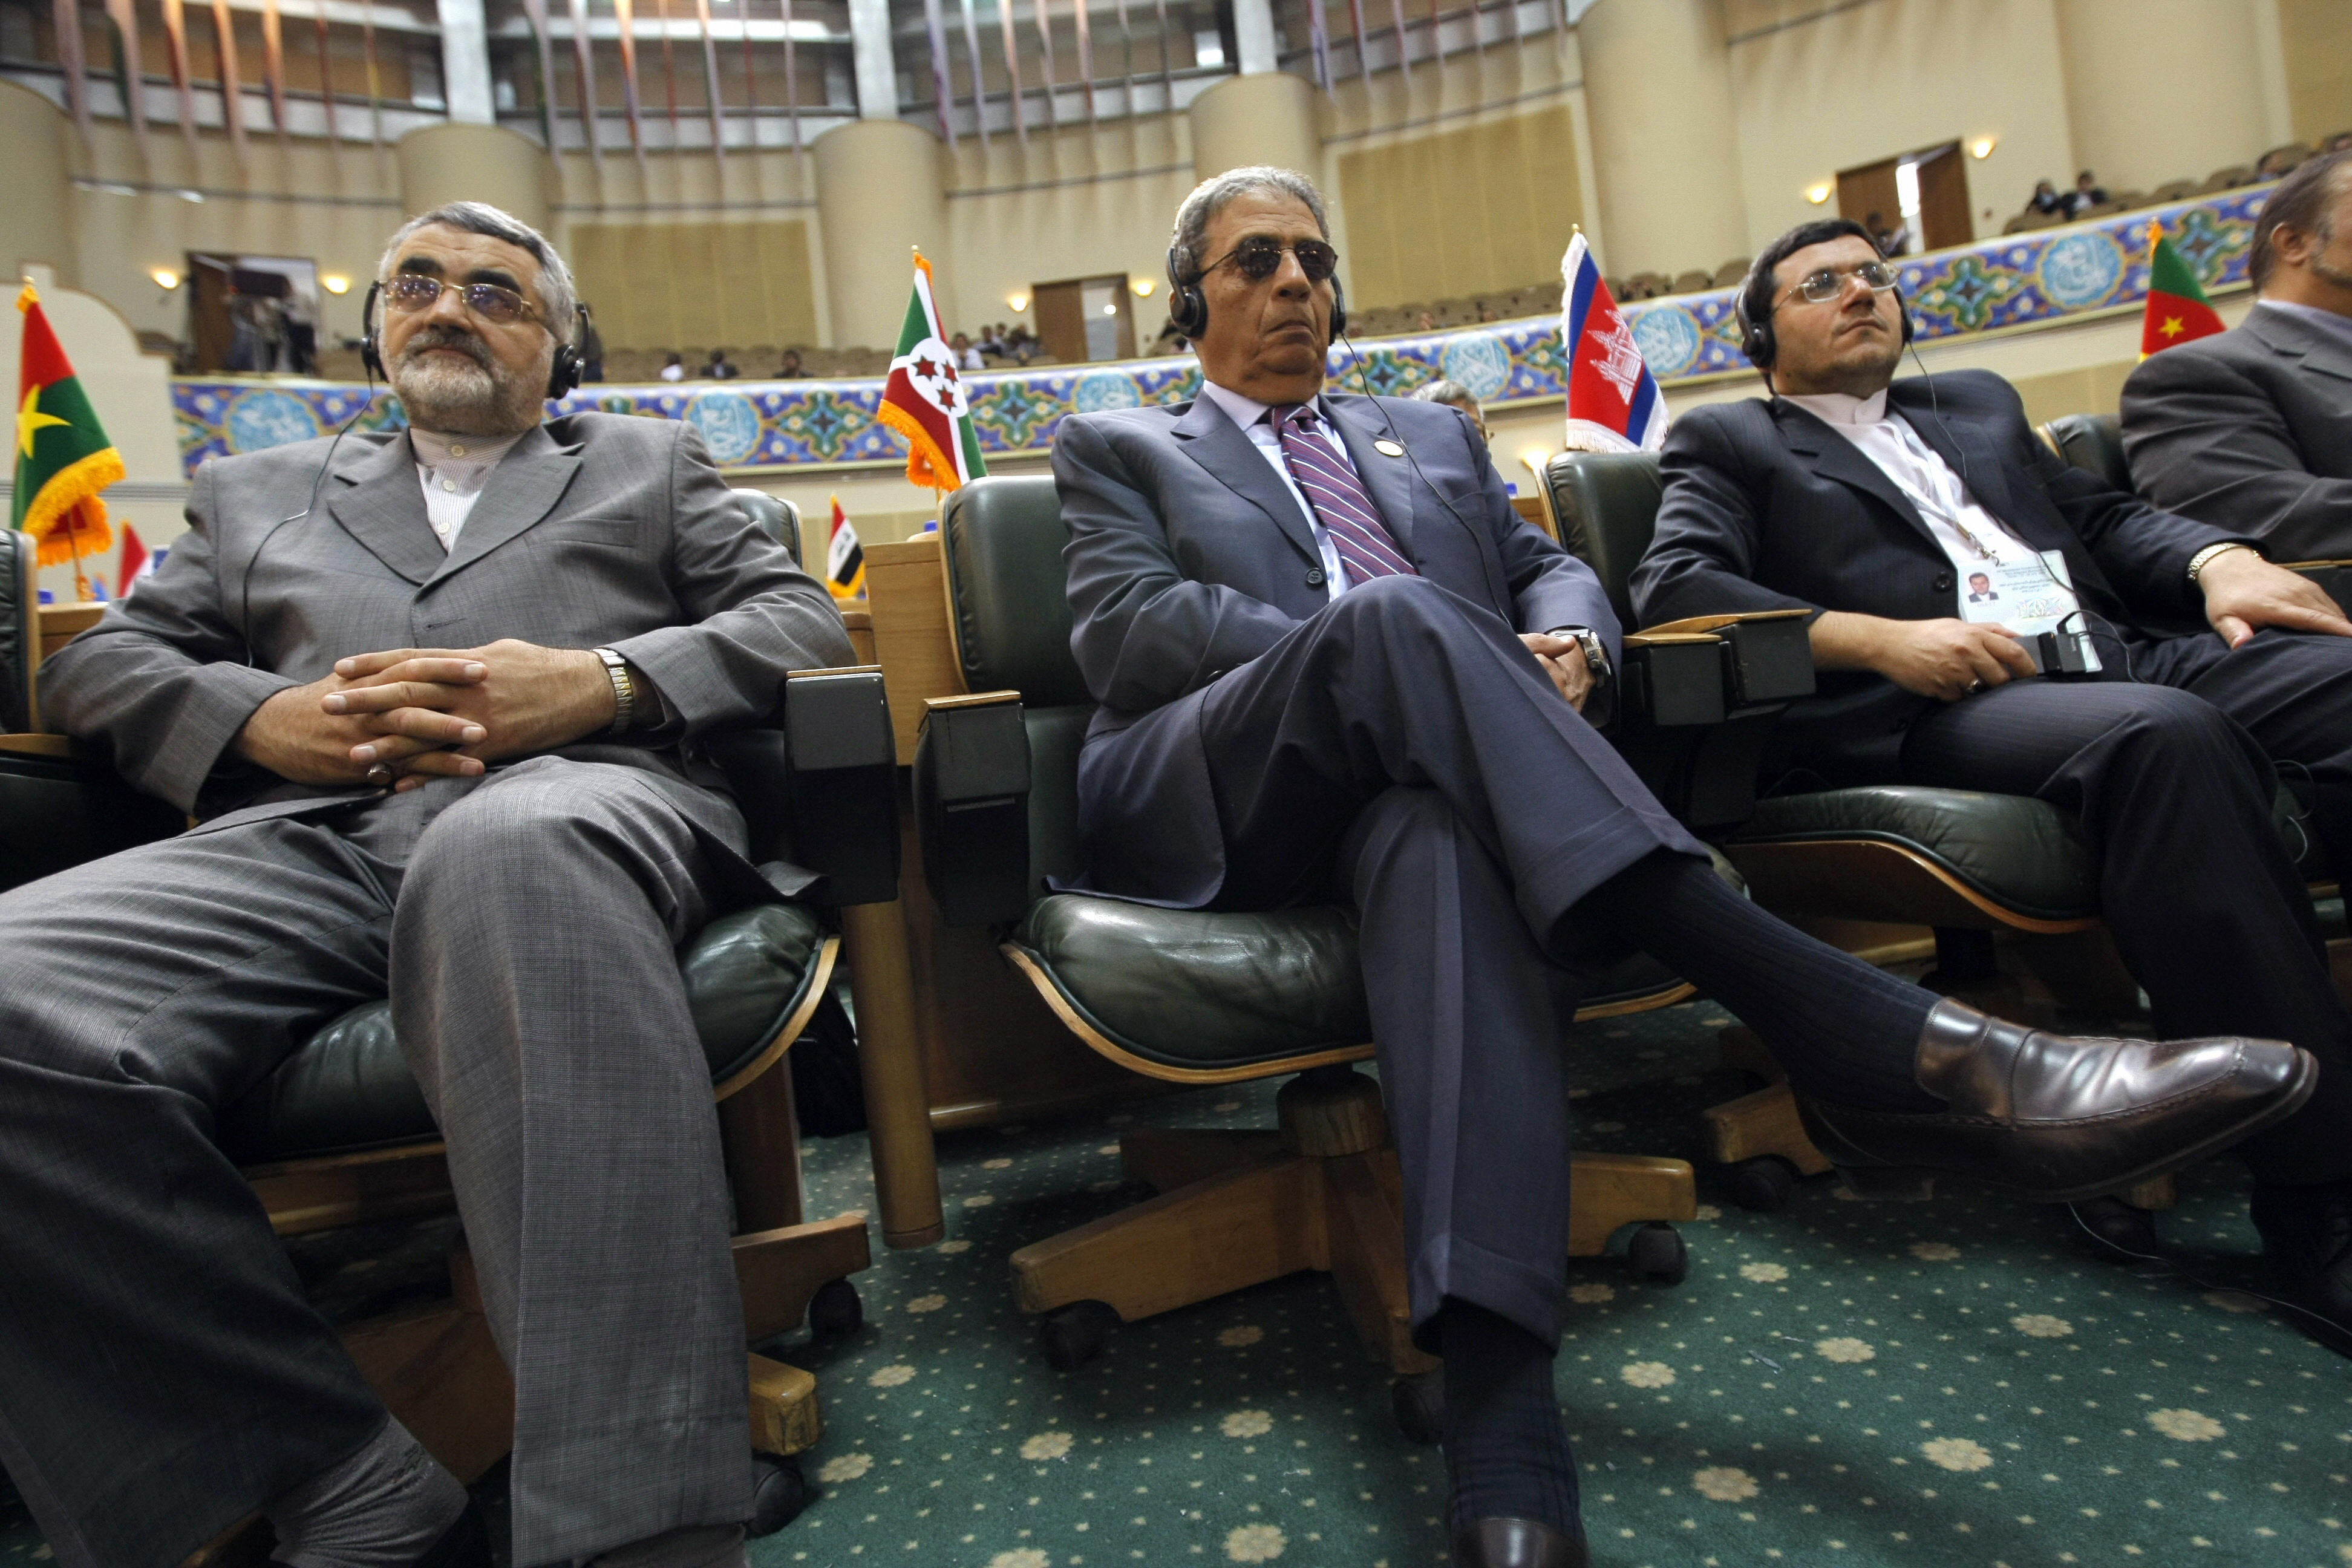 Arab League Secretary General Amr Mussa and Iranian prominent MP, Alaeddin Boroujerdi listen to the speech.